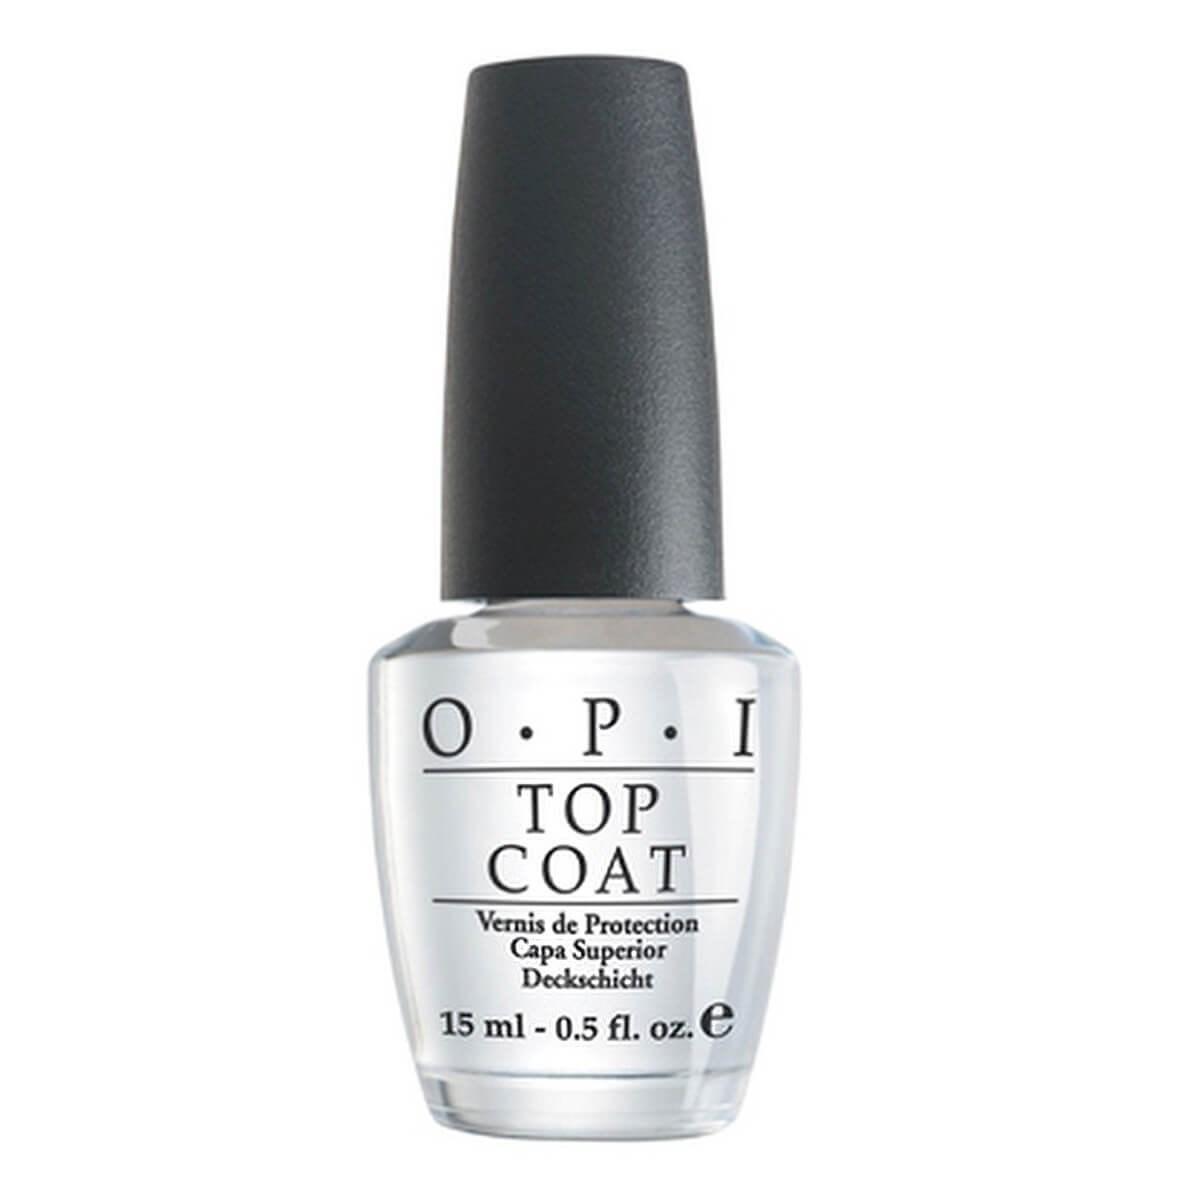 OPI Top Coat Nail Lacque